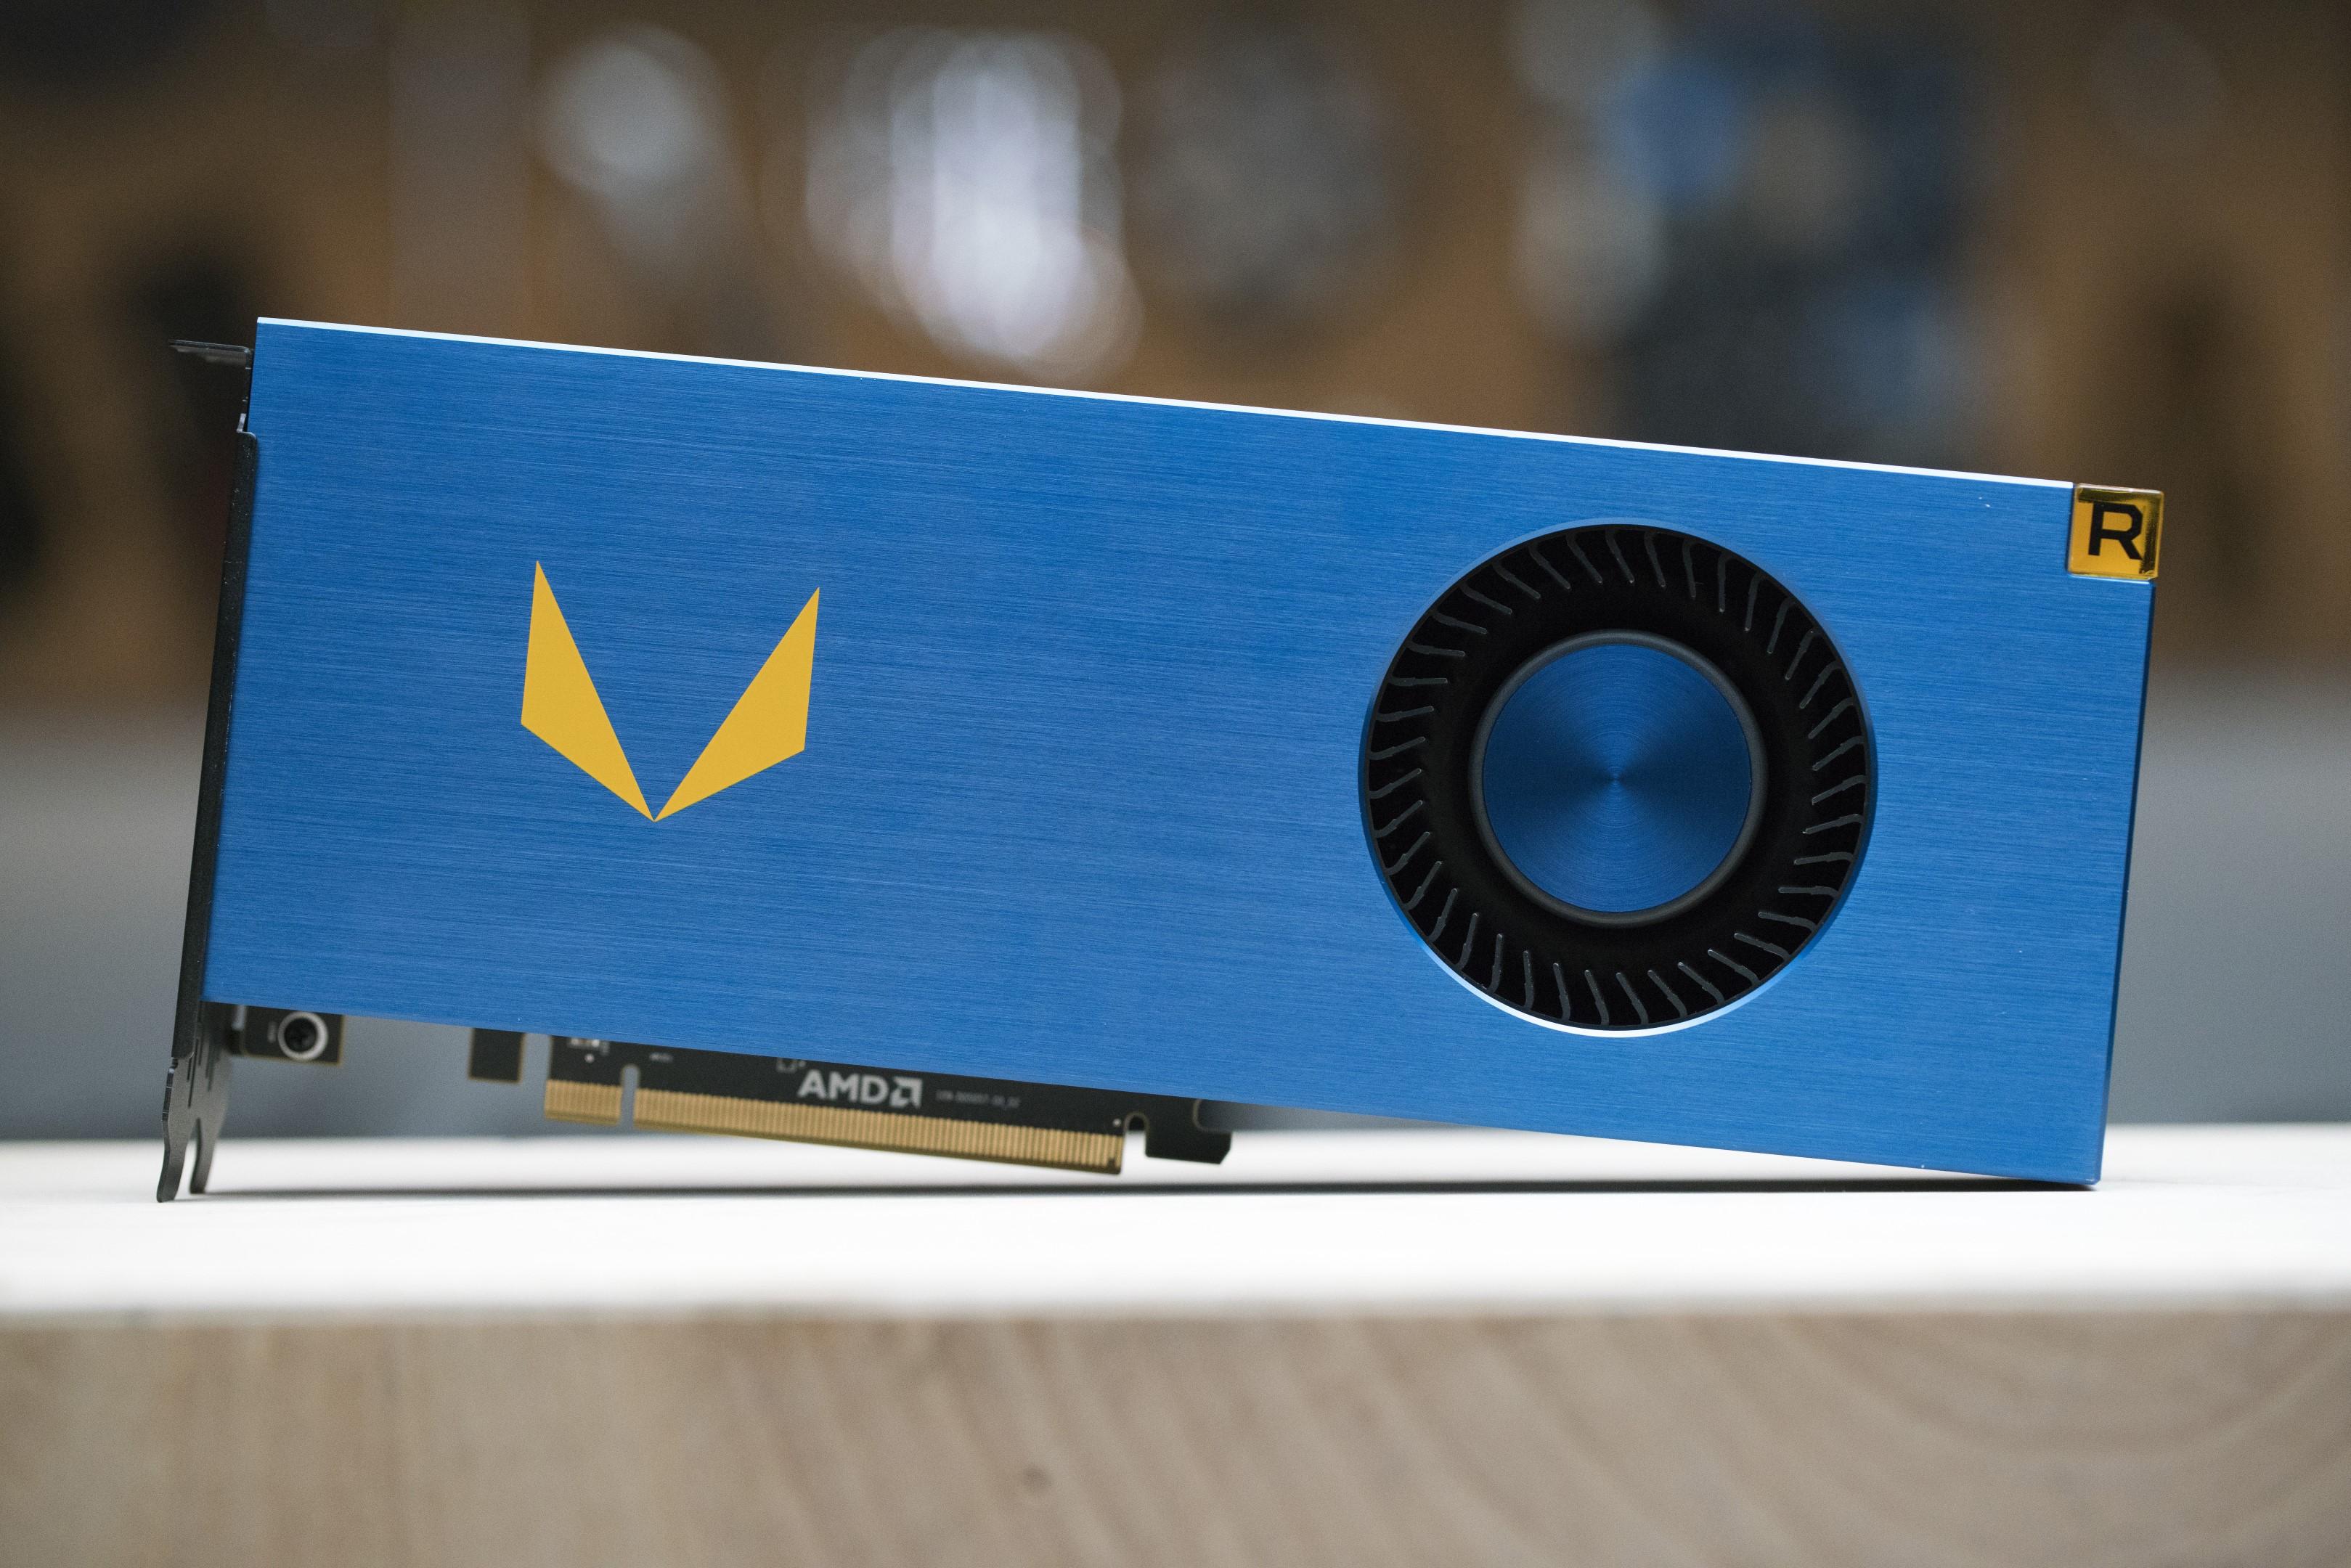 AMD Radeon Vega Frontier Edition 16 GB Graphics Card Previewed